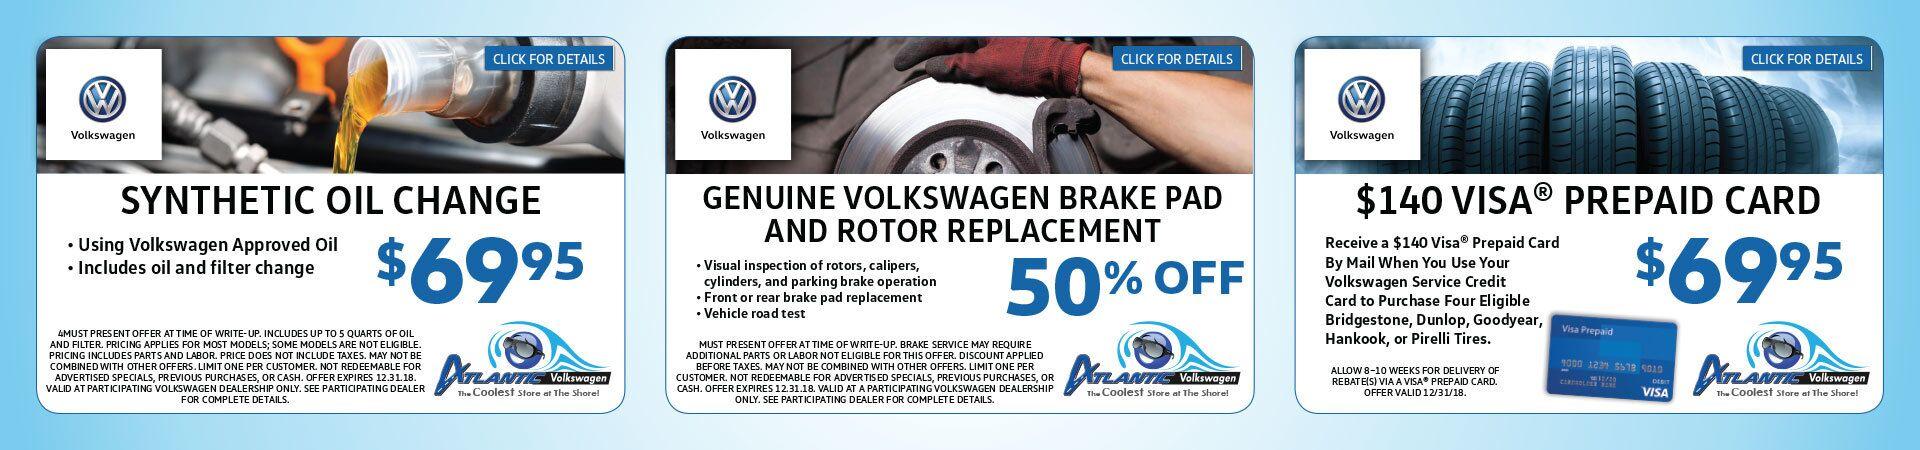 Volkswagen Dealership West Islip Ny Used Cars Atlantic